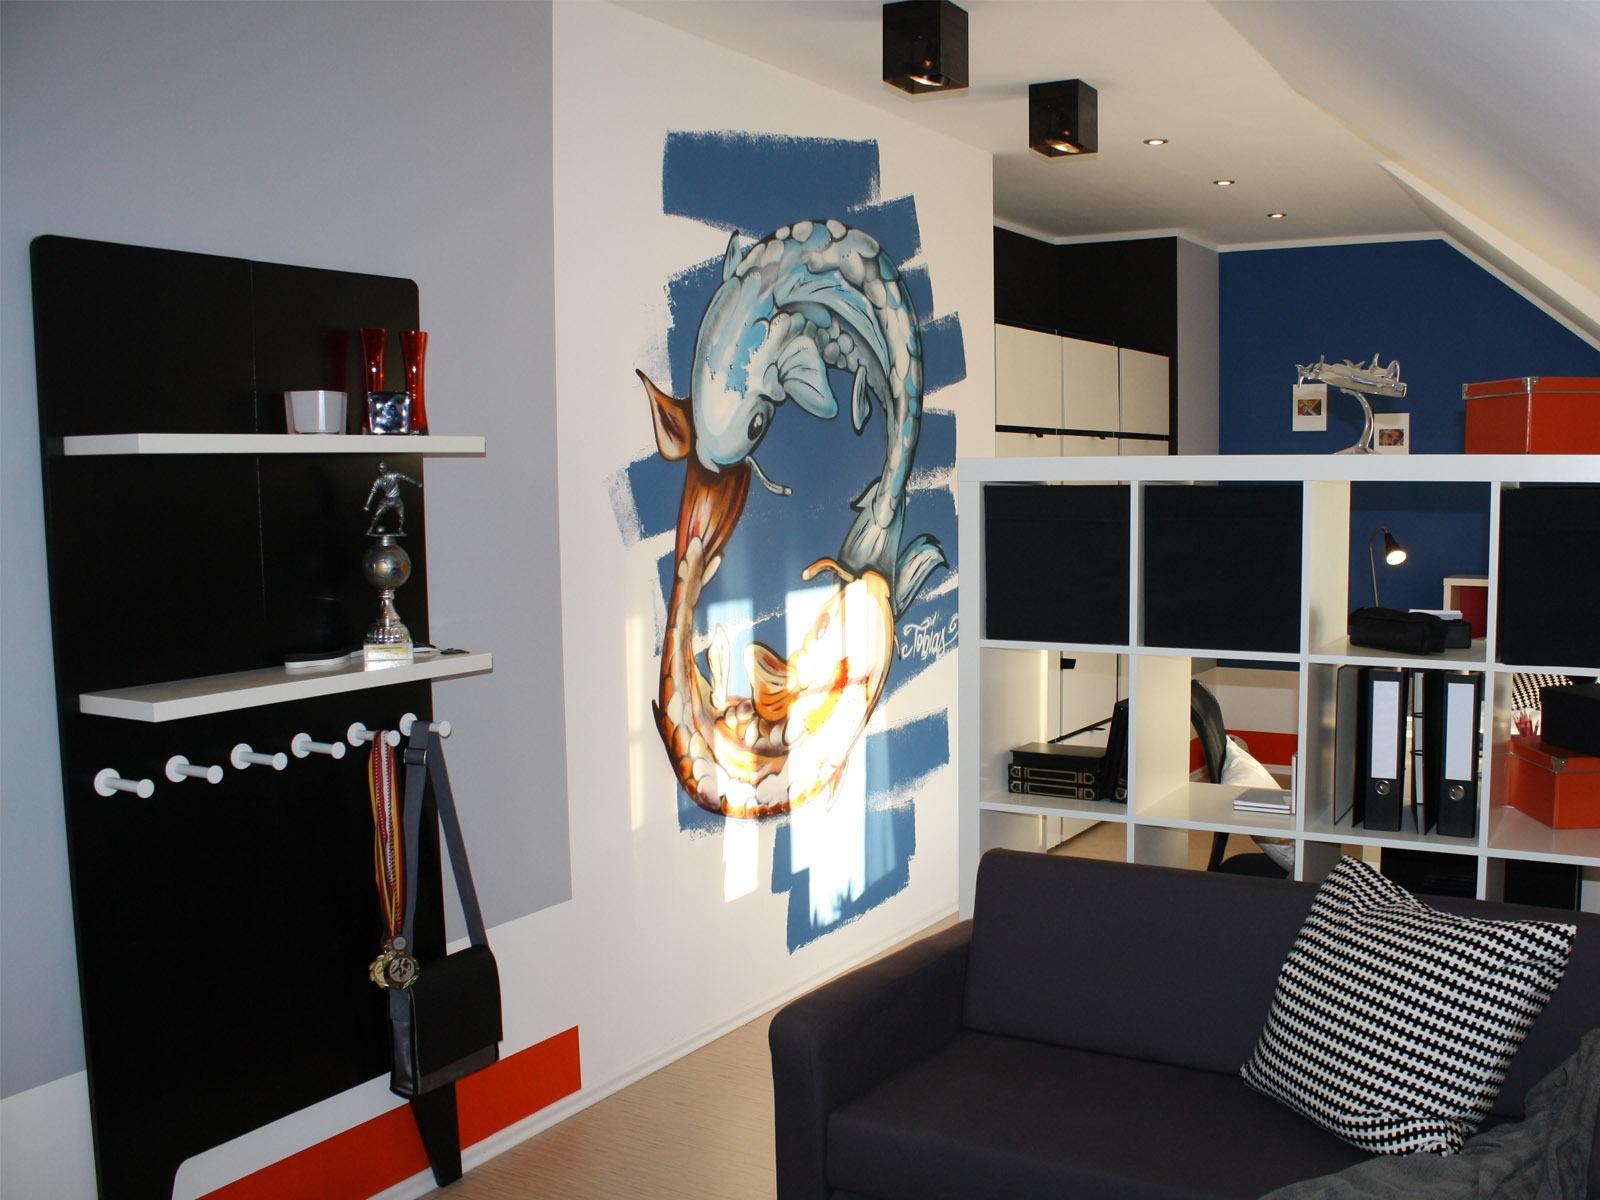 wandmalerei agentur artmos4 graffitiauftrag und graffitik nstler. Black Bedroom Furniture Sets. Home Design Ideas